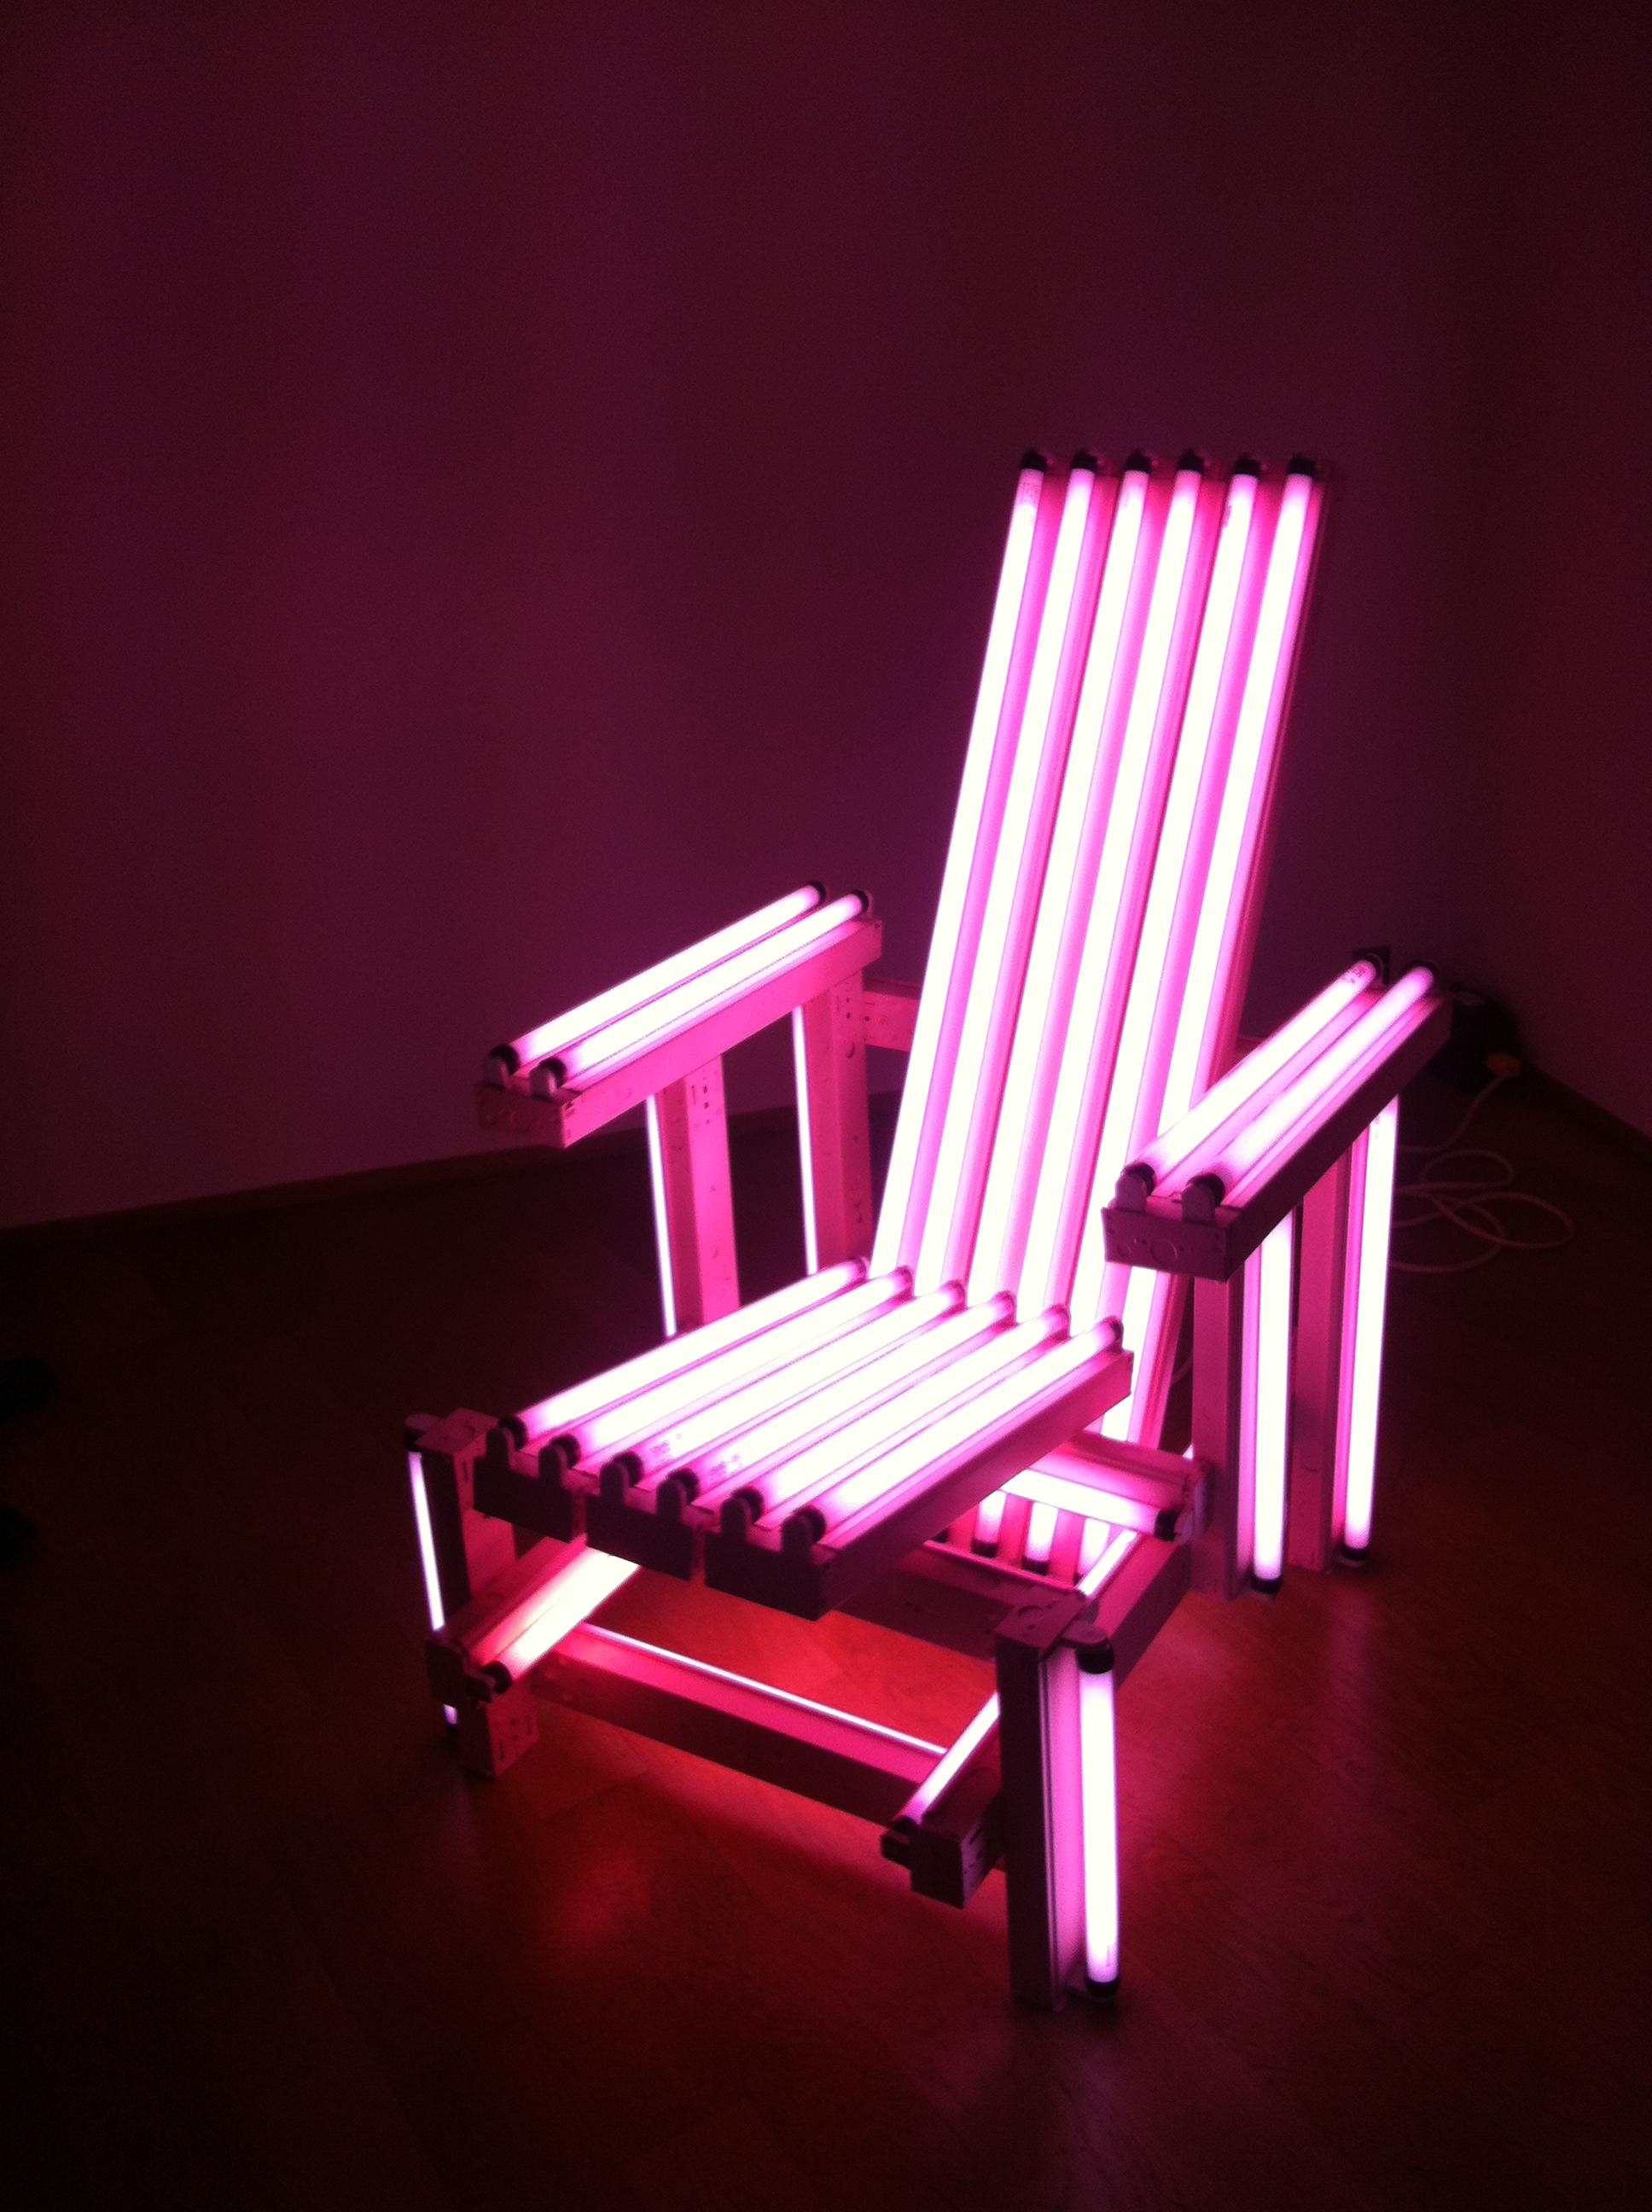 Ivan Navarro's Electric Chair